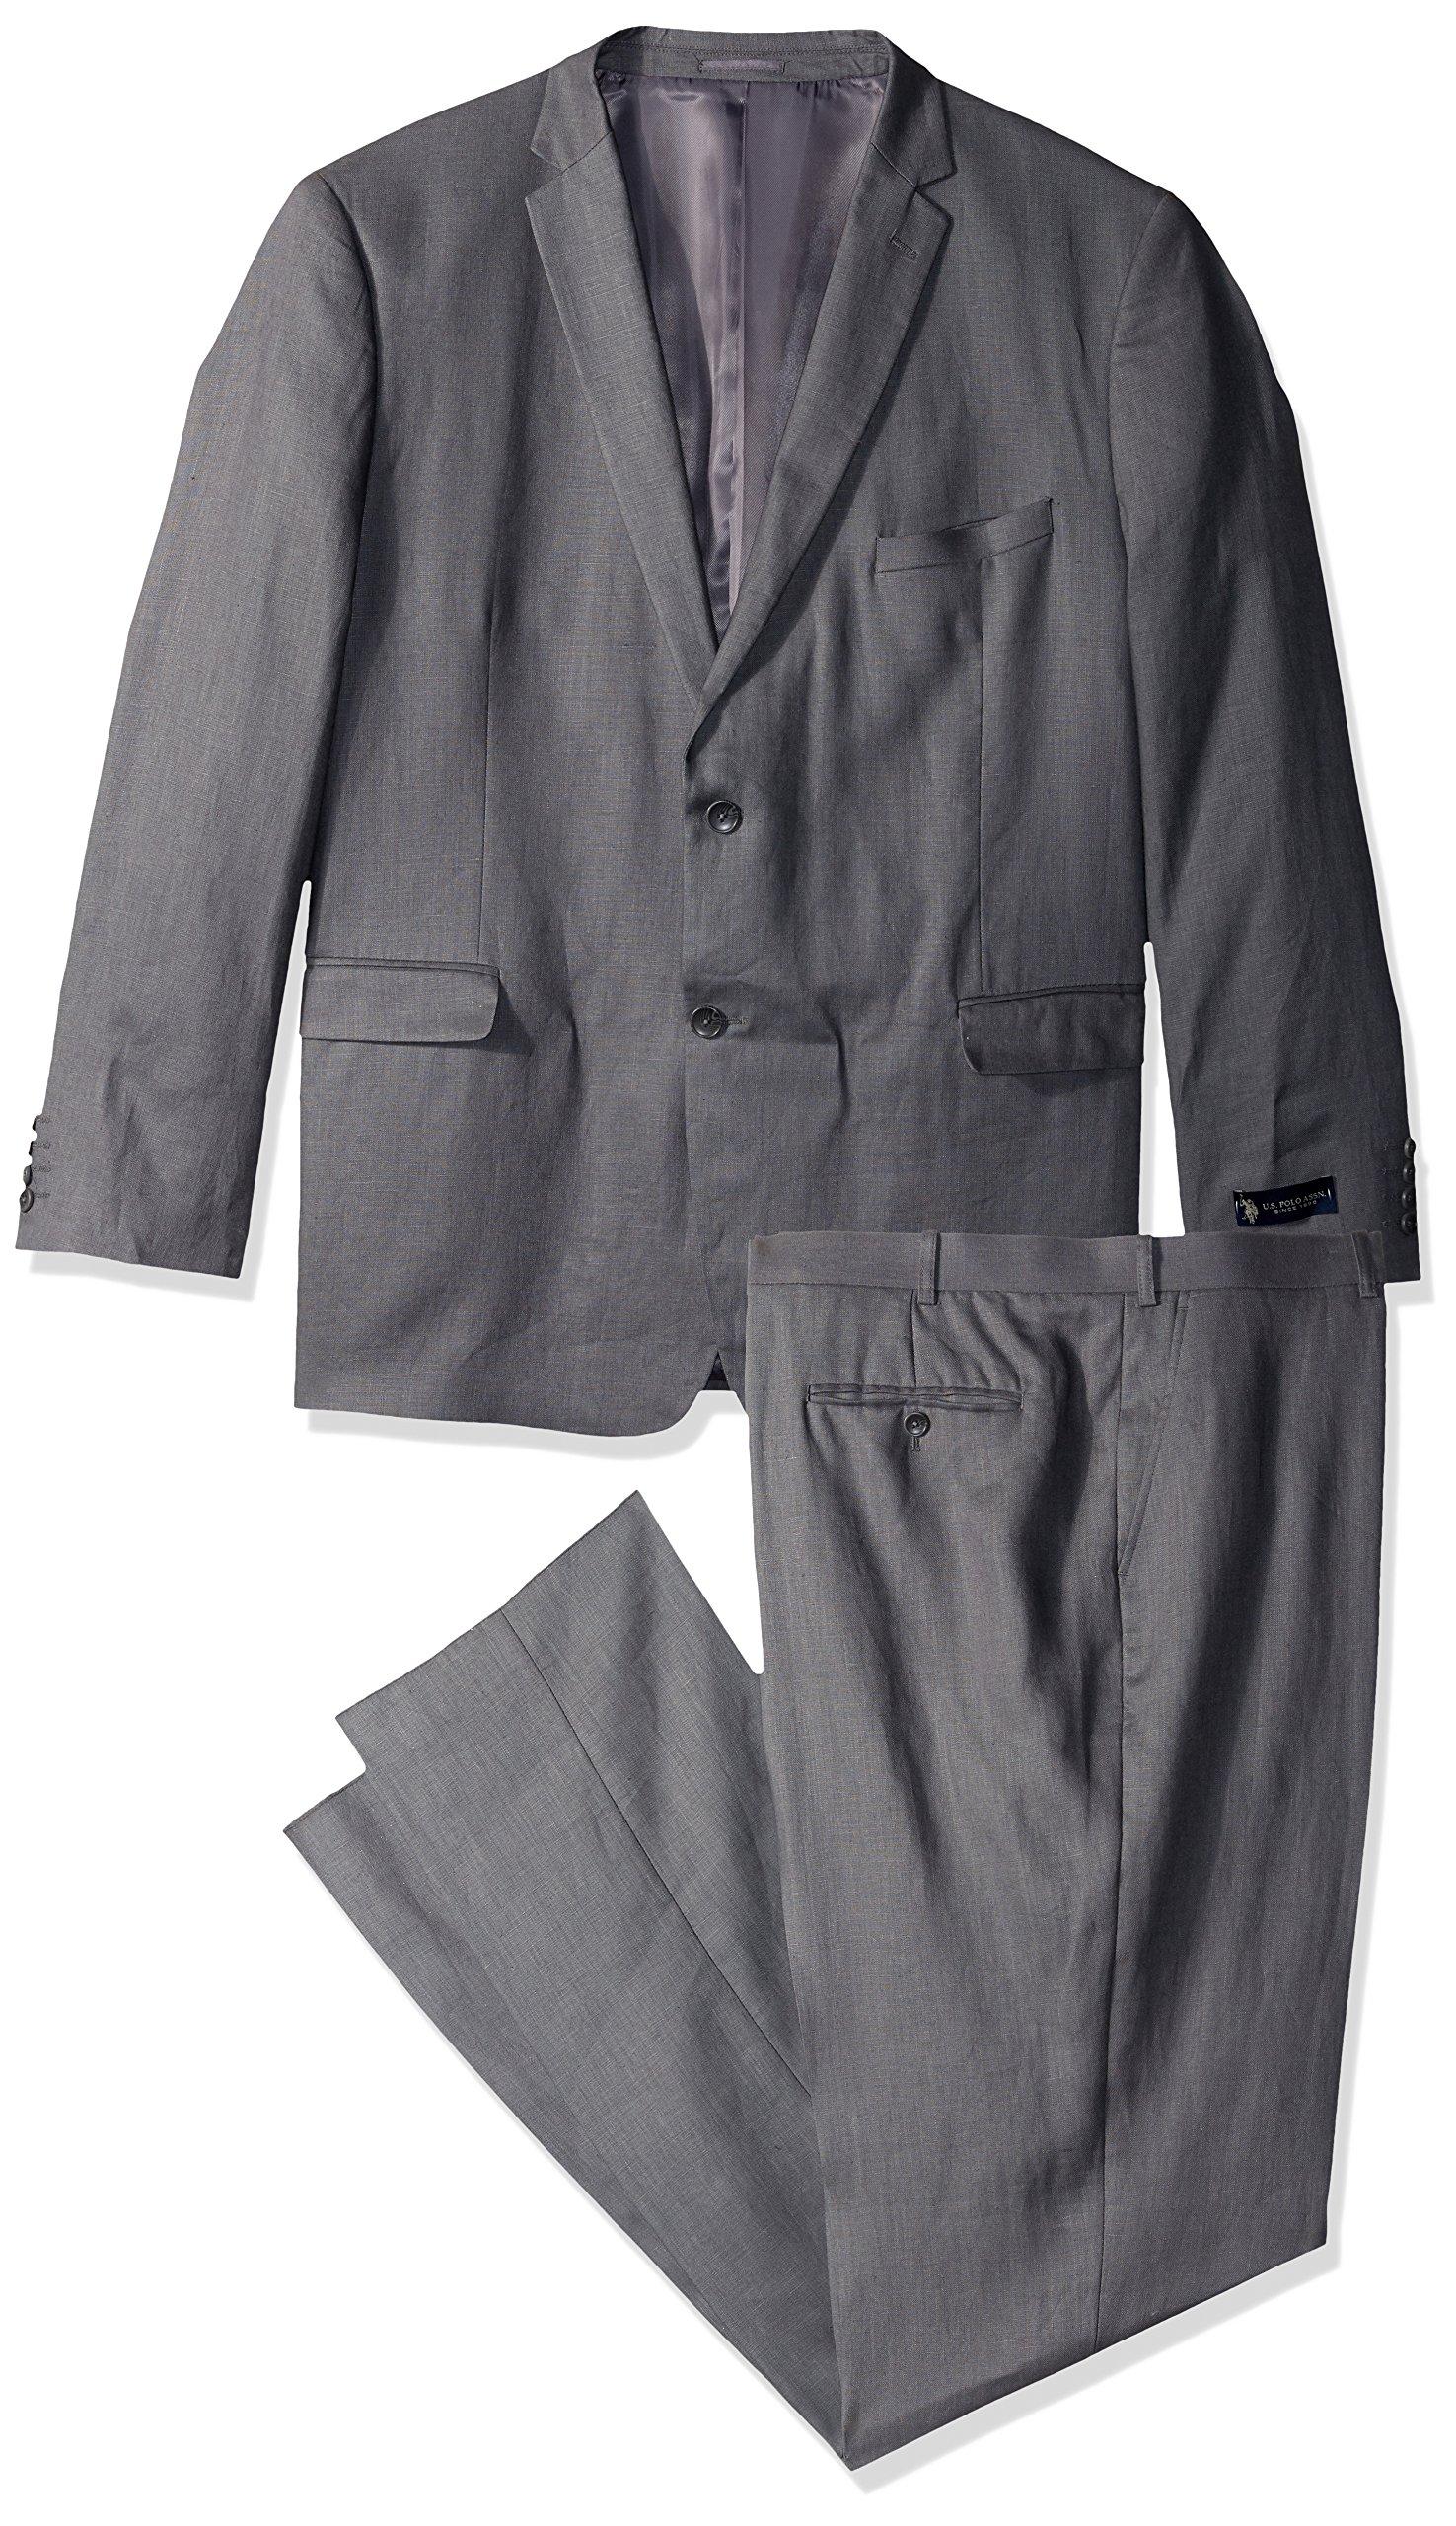 U.S. Polo Assn.. Men's Big and Tall Linen Suit, Grey, 50 Regular